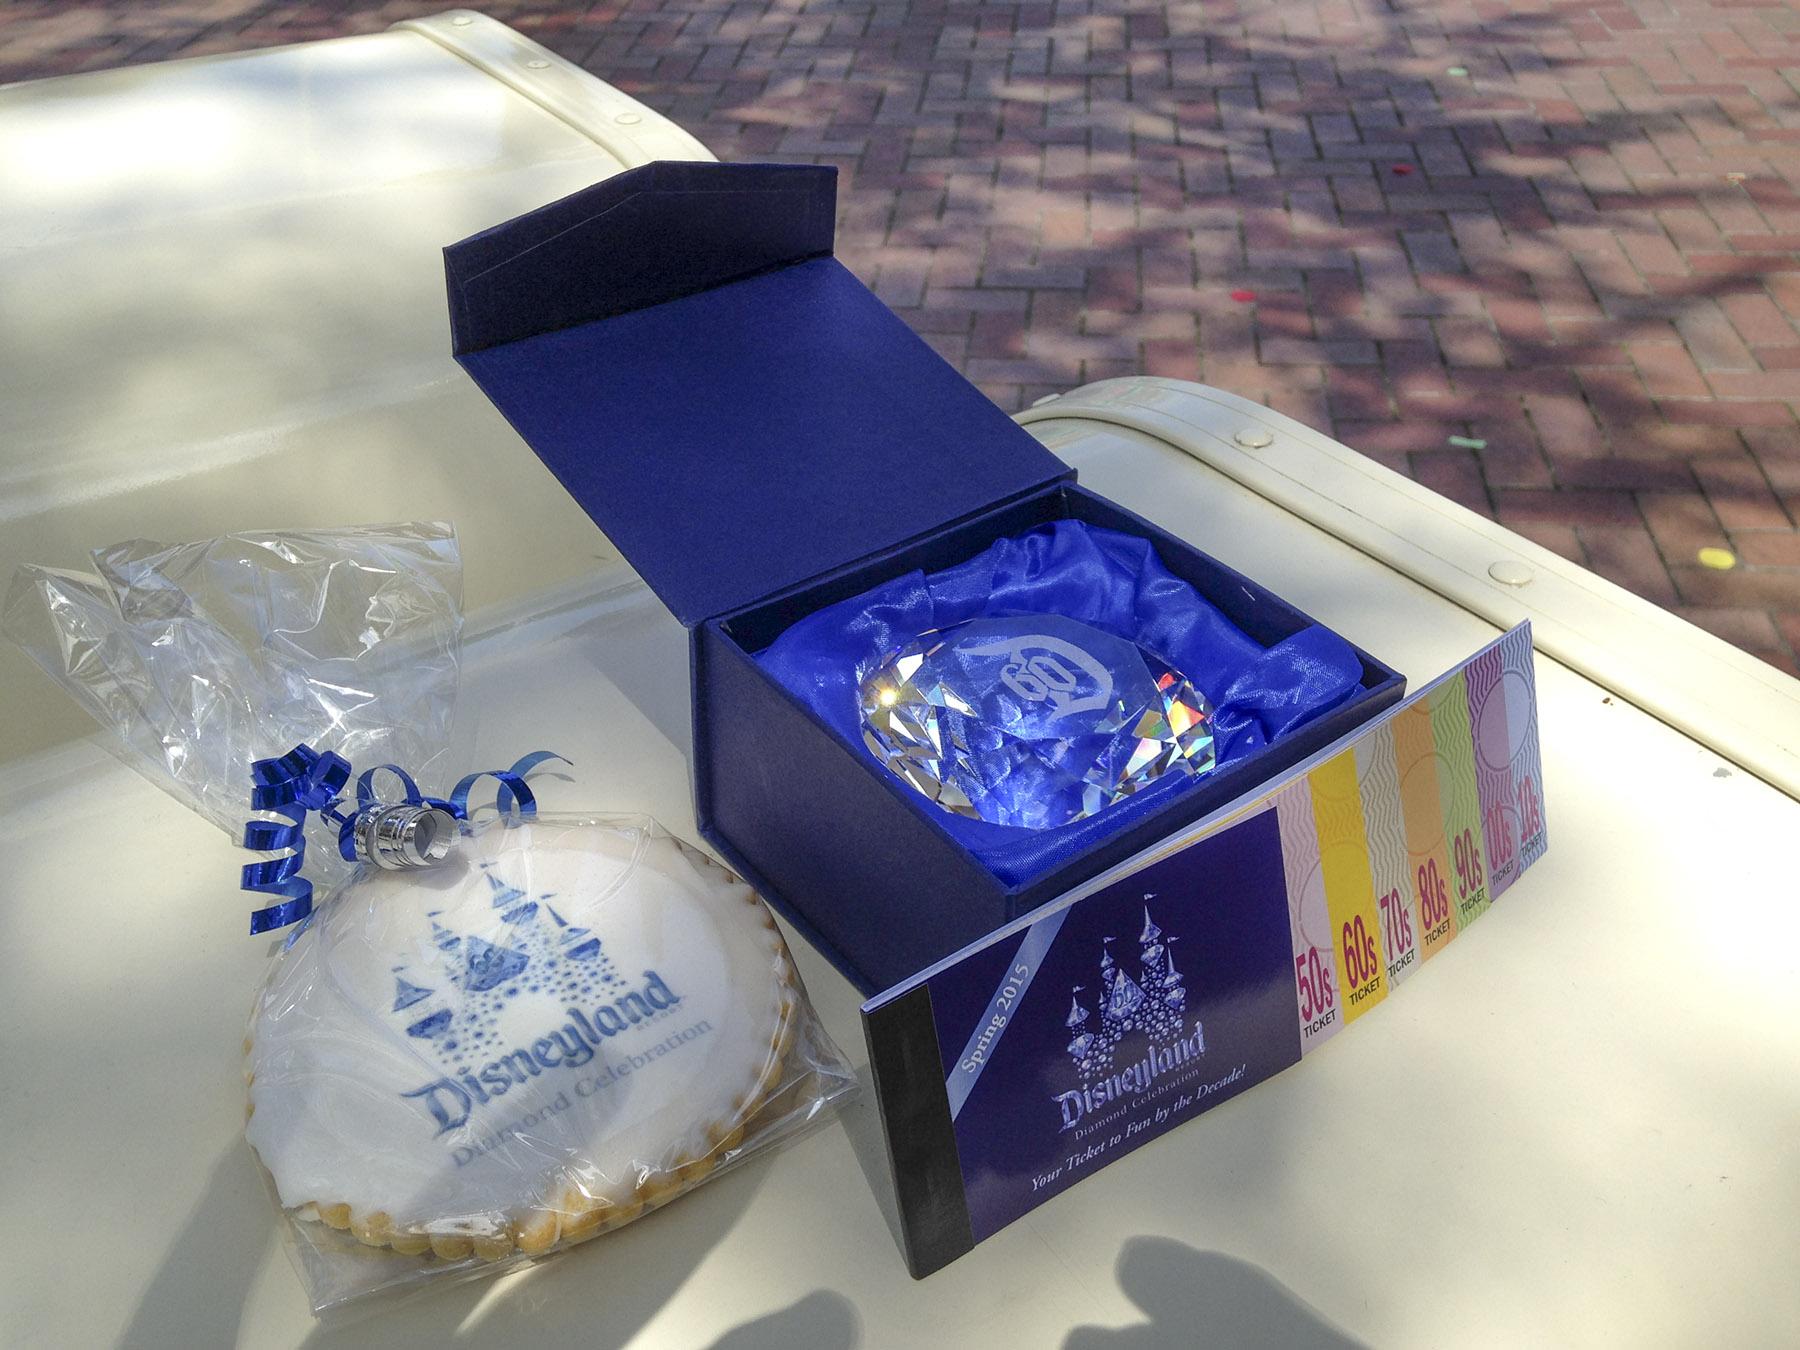 Disneyland announces 60th anniversary diamond celebration plans amidst 1800x1350